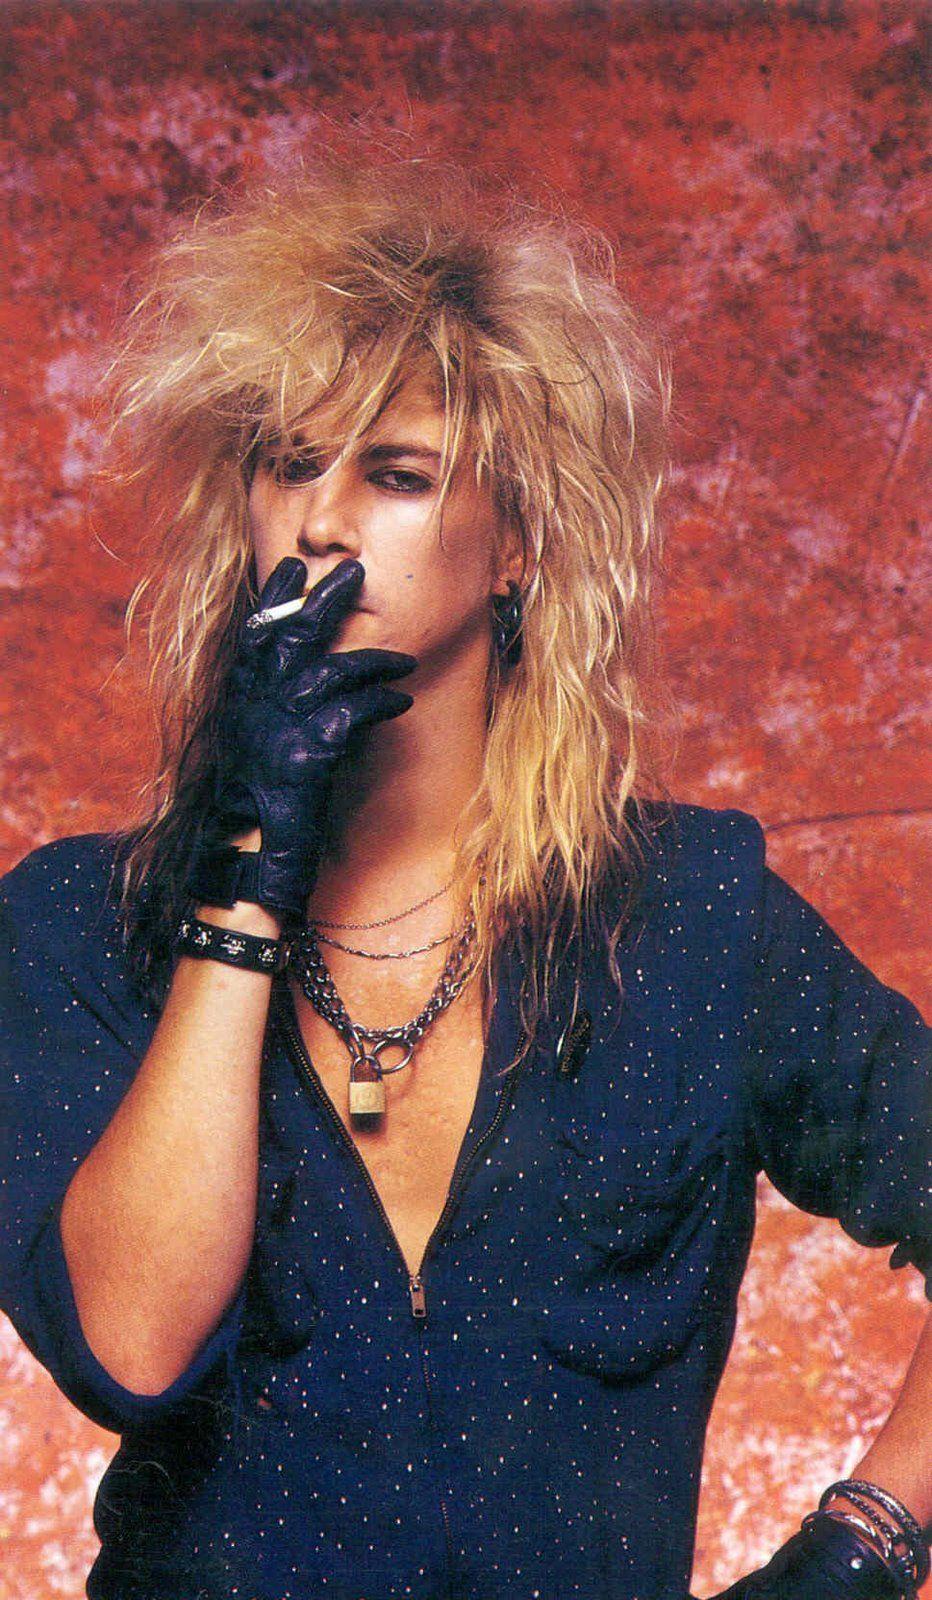 OhMy80's : Photo | rockstars | Pinterest | Duff mckagan ... Duff Mckagan 80s